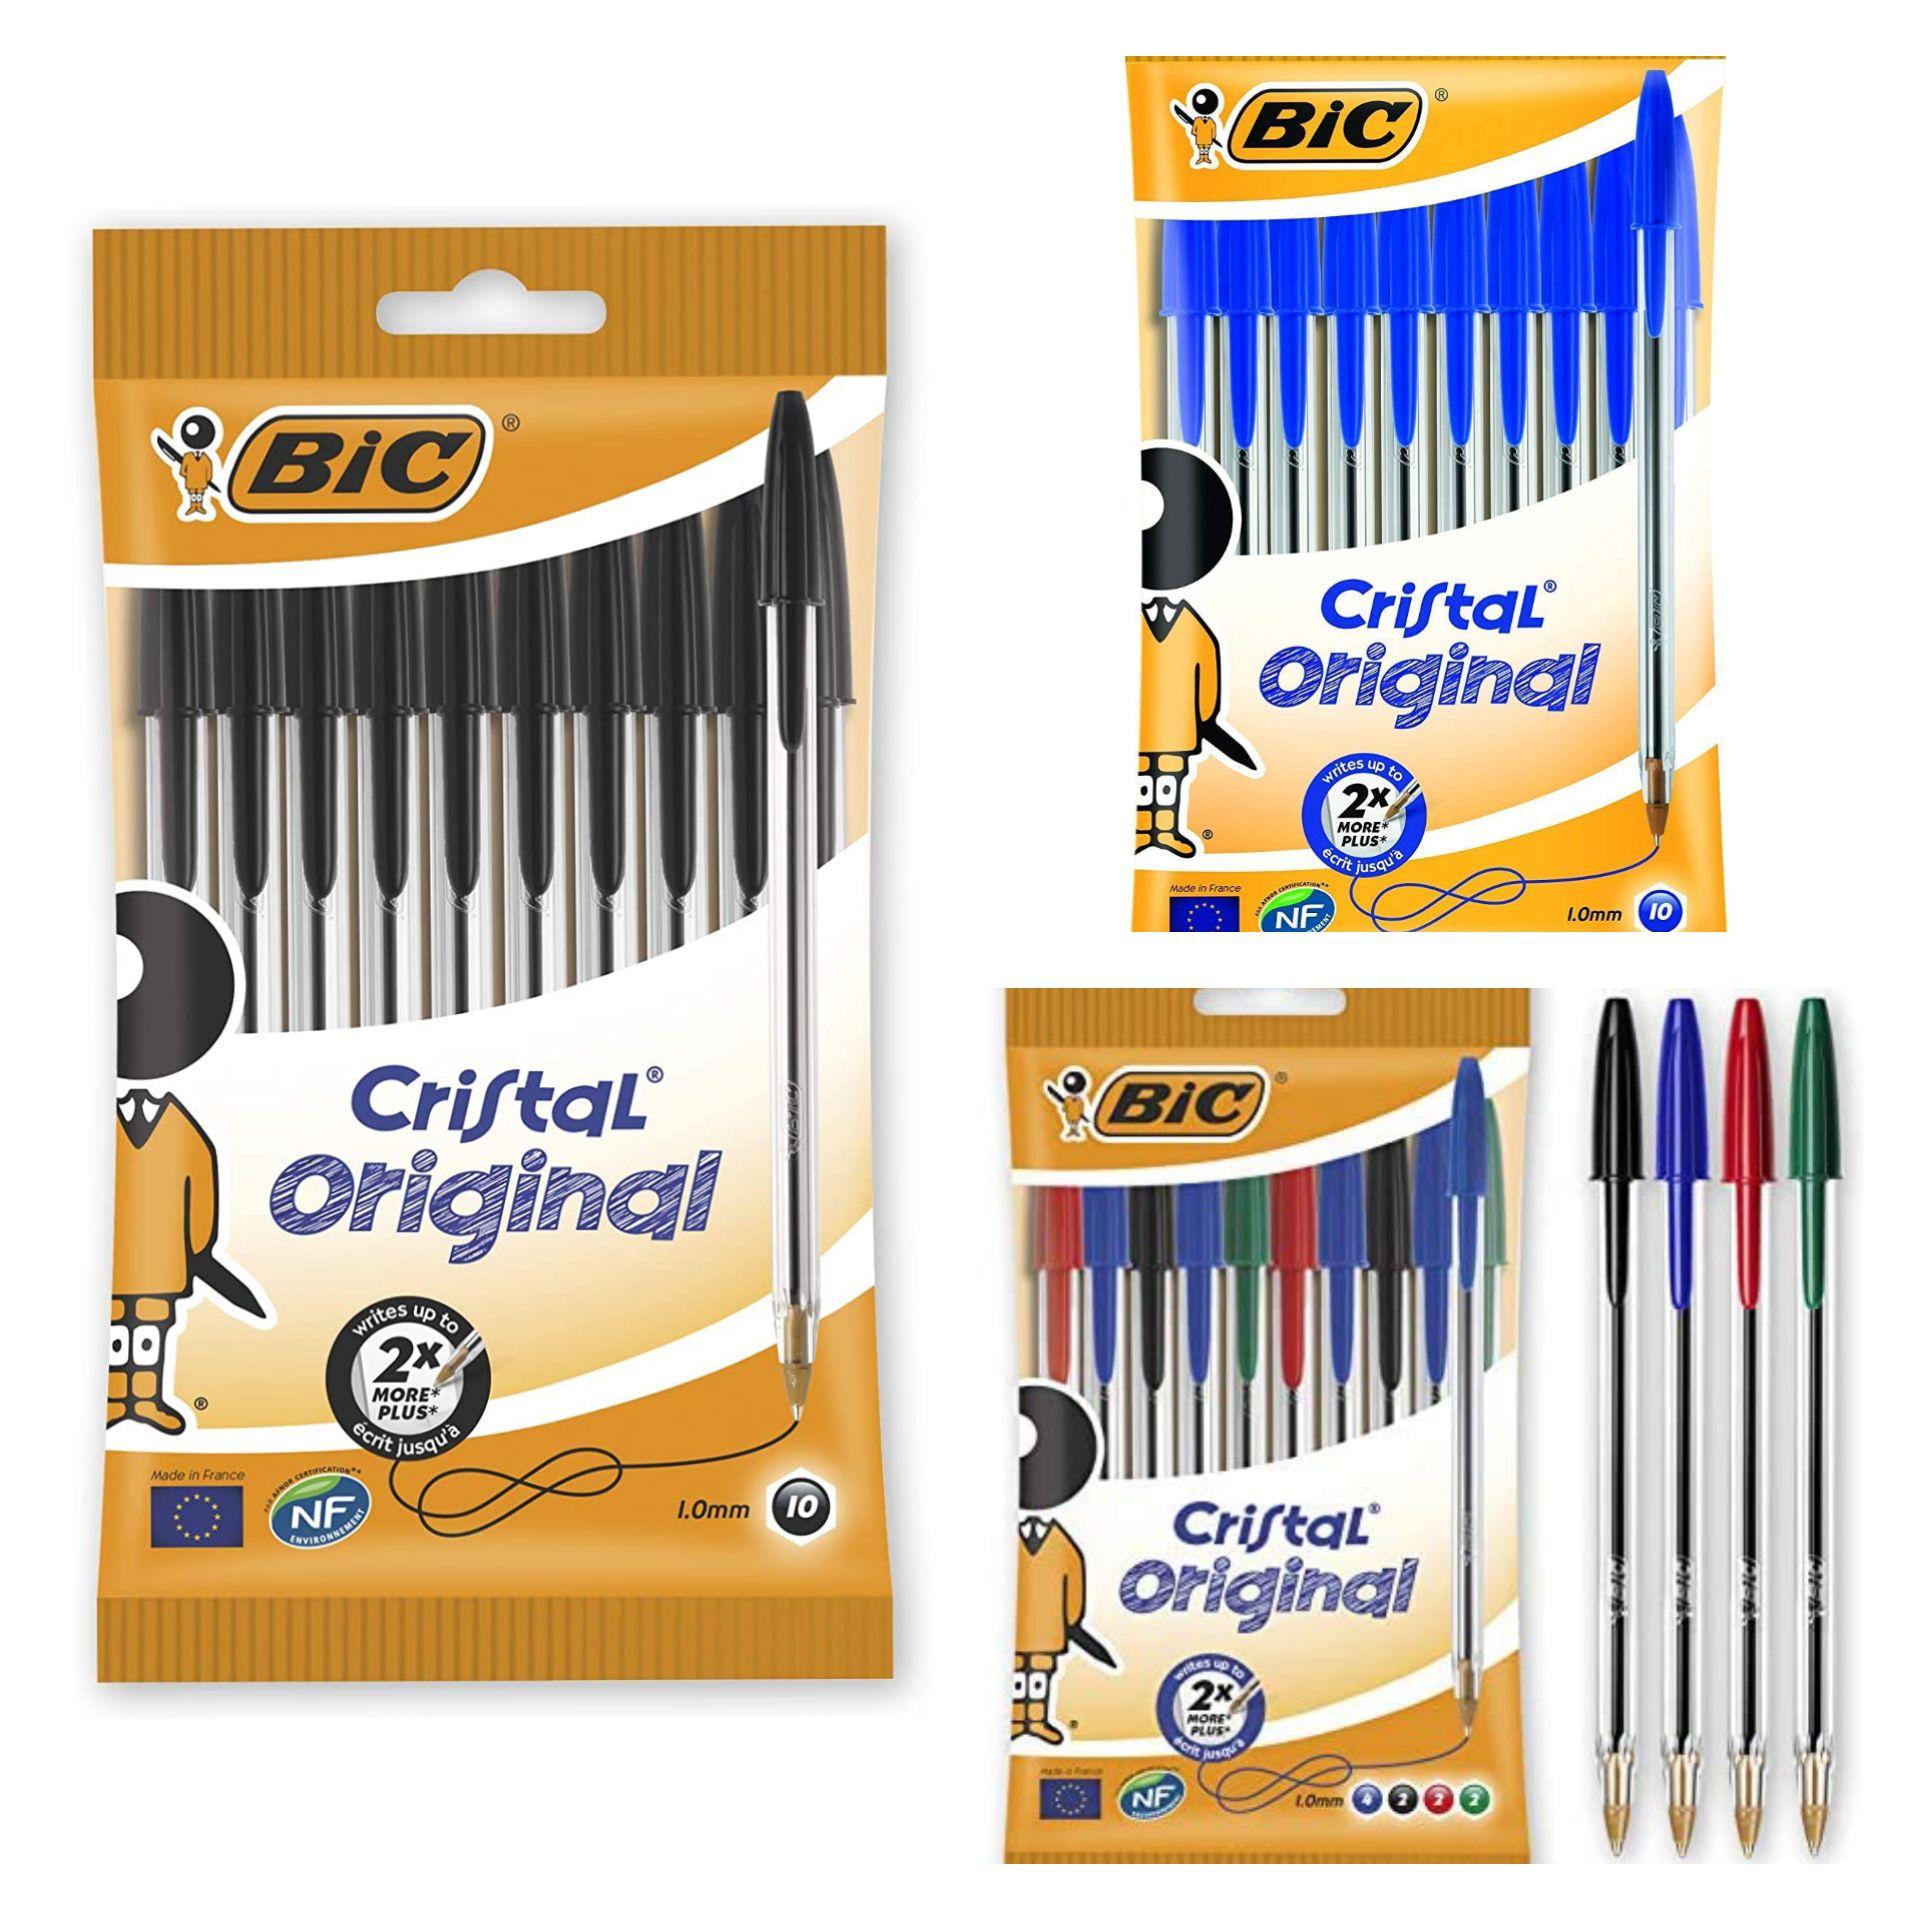 Bic Cristal Original Ballpoint Pens, Pack of 10, Medium Point (1.0 mm), Smudge-Free black/assorted/blue £1.50 (£4.49 p&p non prime) @ Amazon